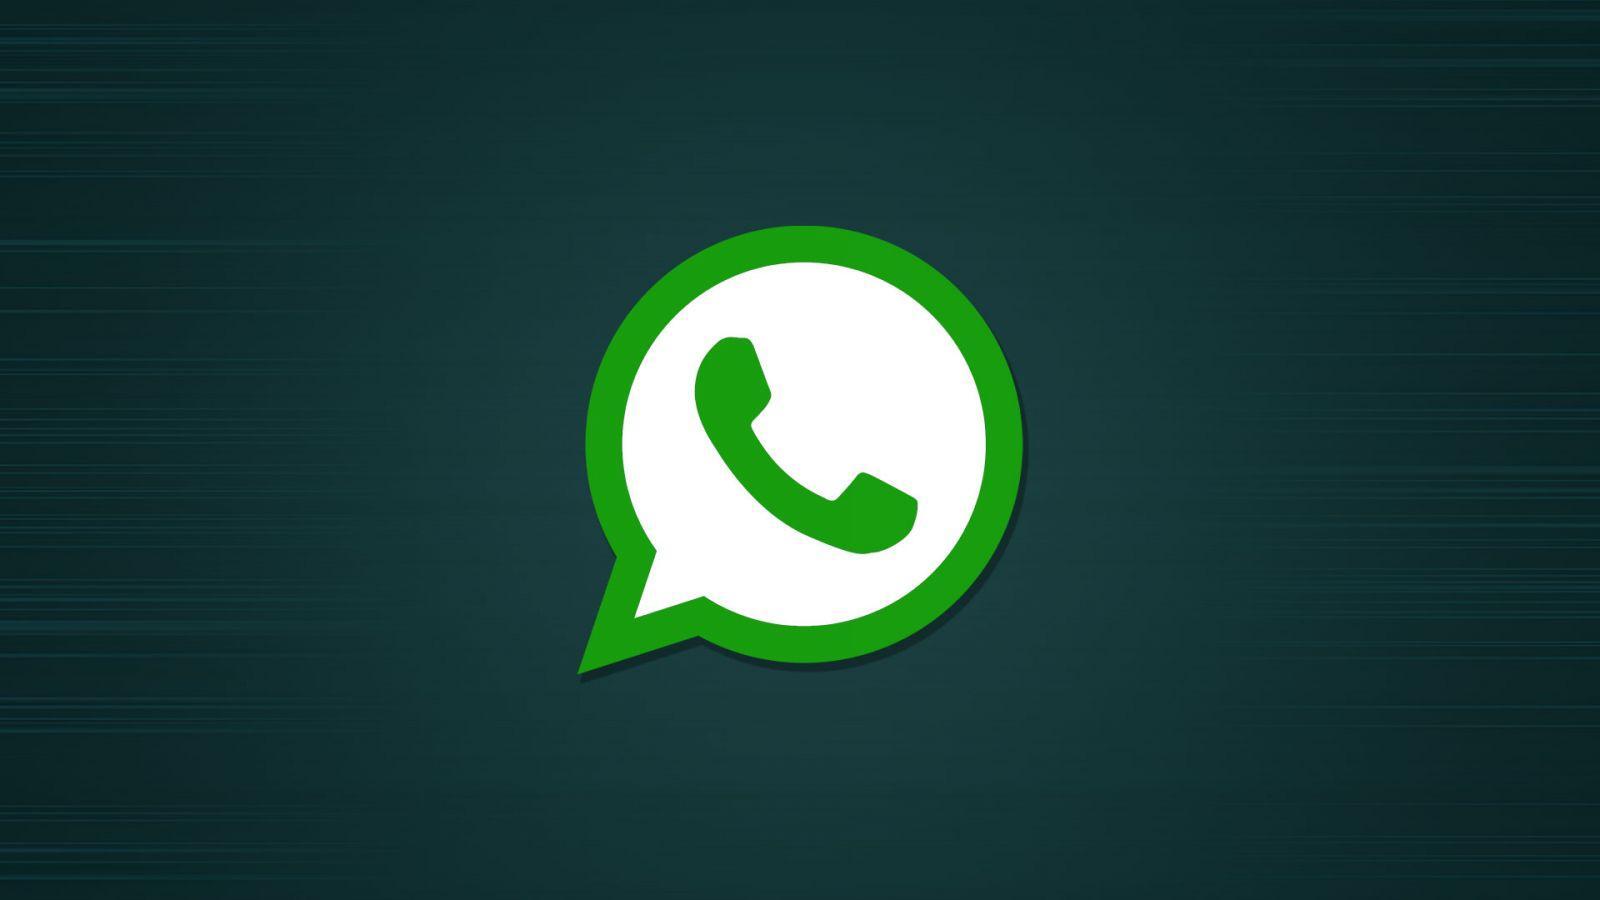 Логотип приложение WhatsApp